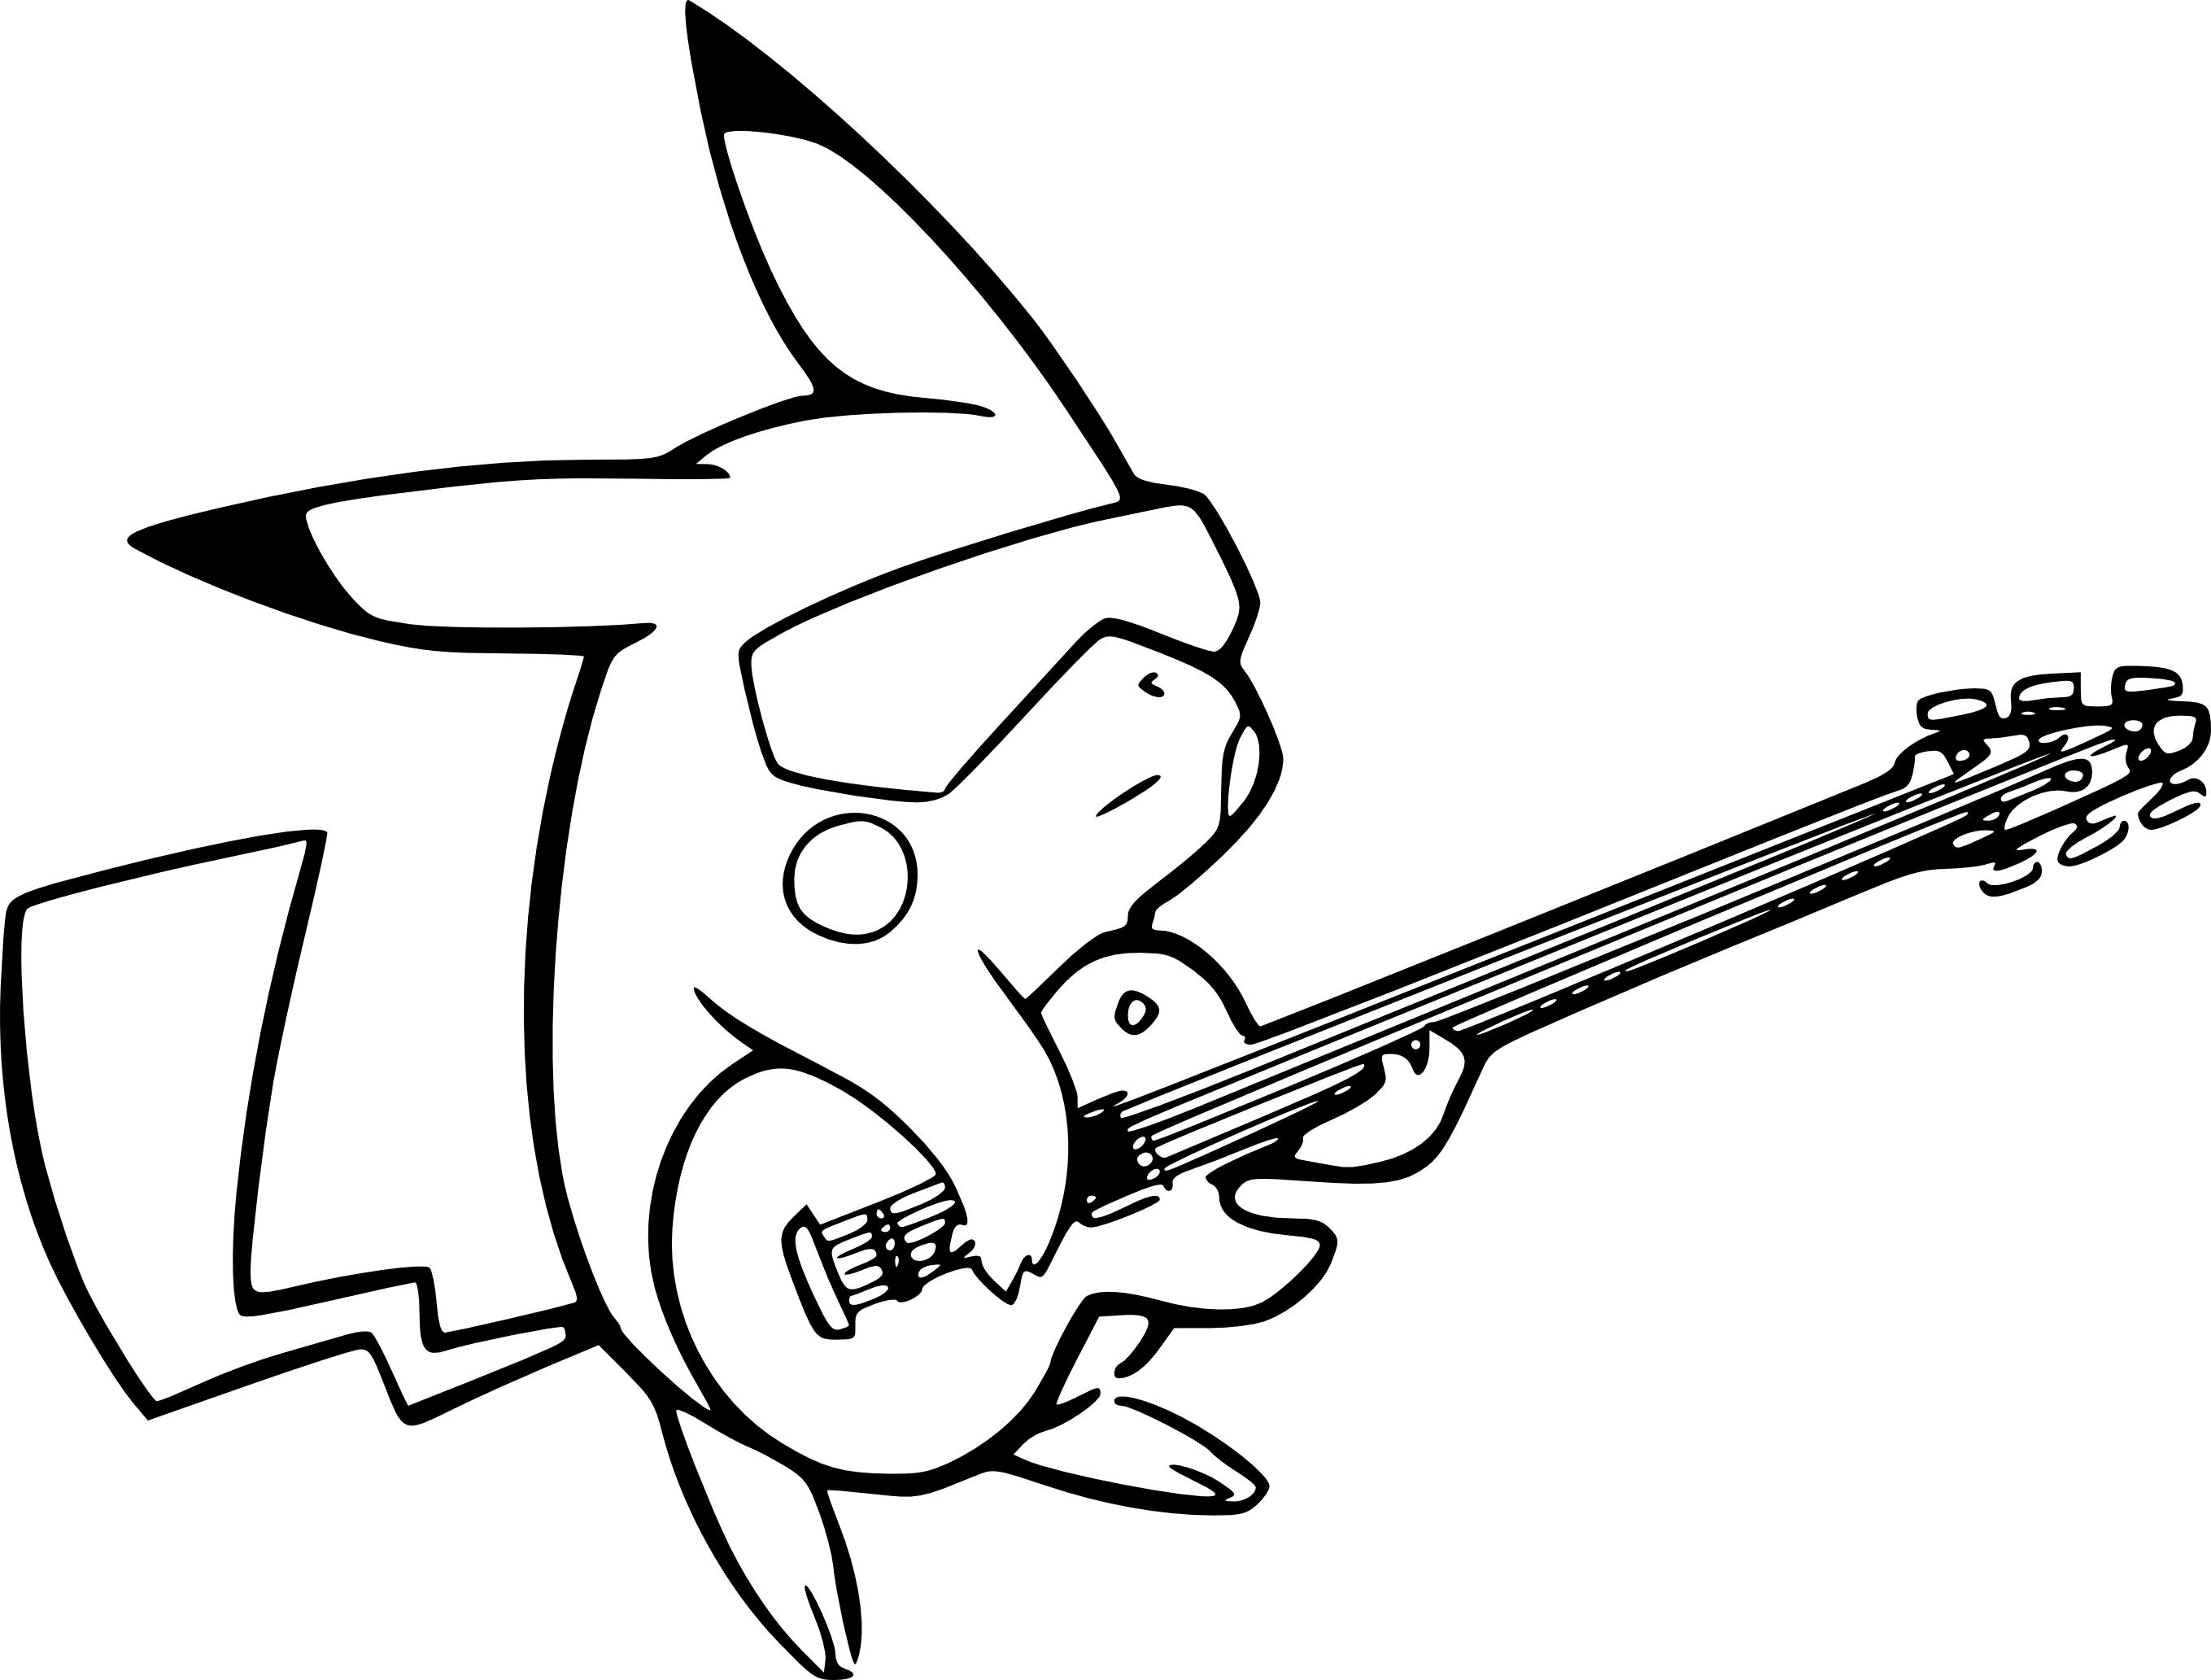 Download Coloriage Imprimer Gratuit Pokemon PNG - Malvorlagen fur kinder Kostenlos